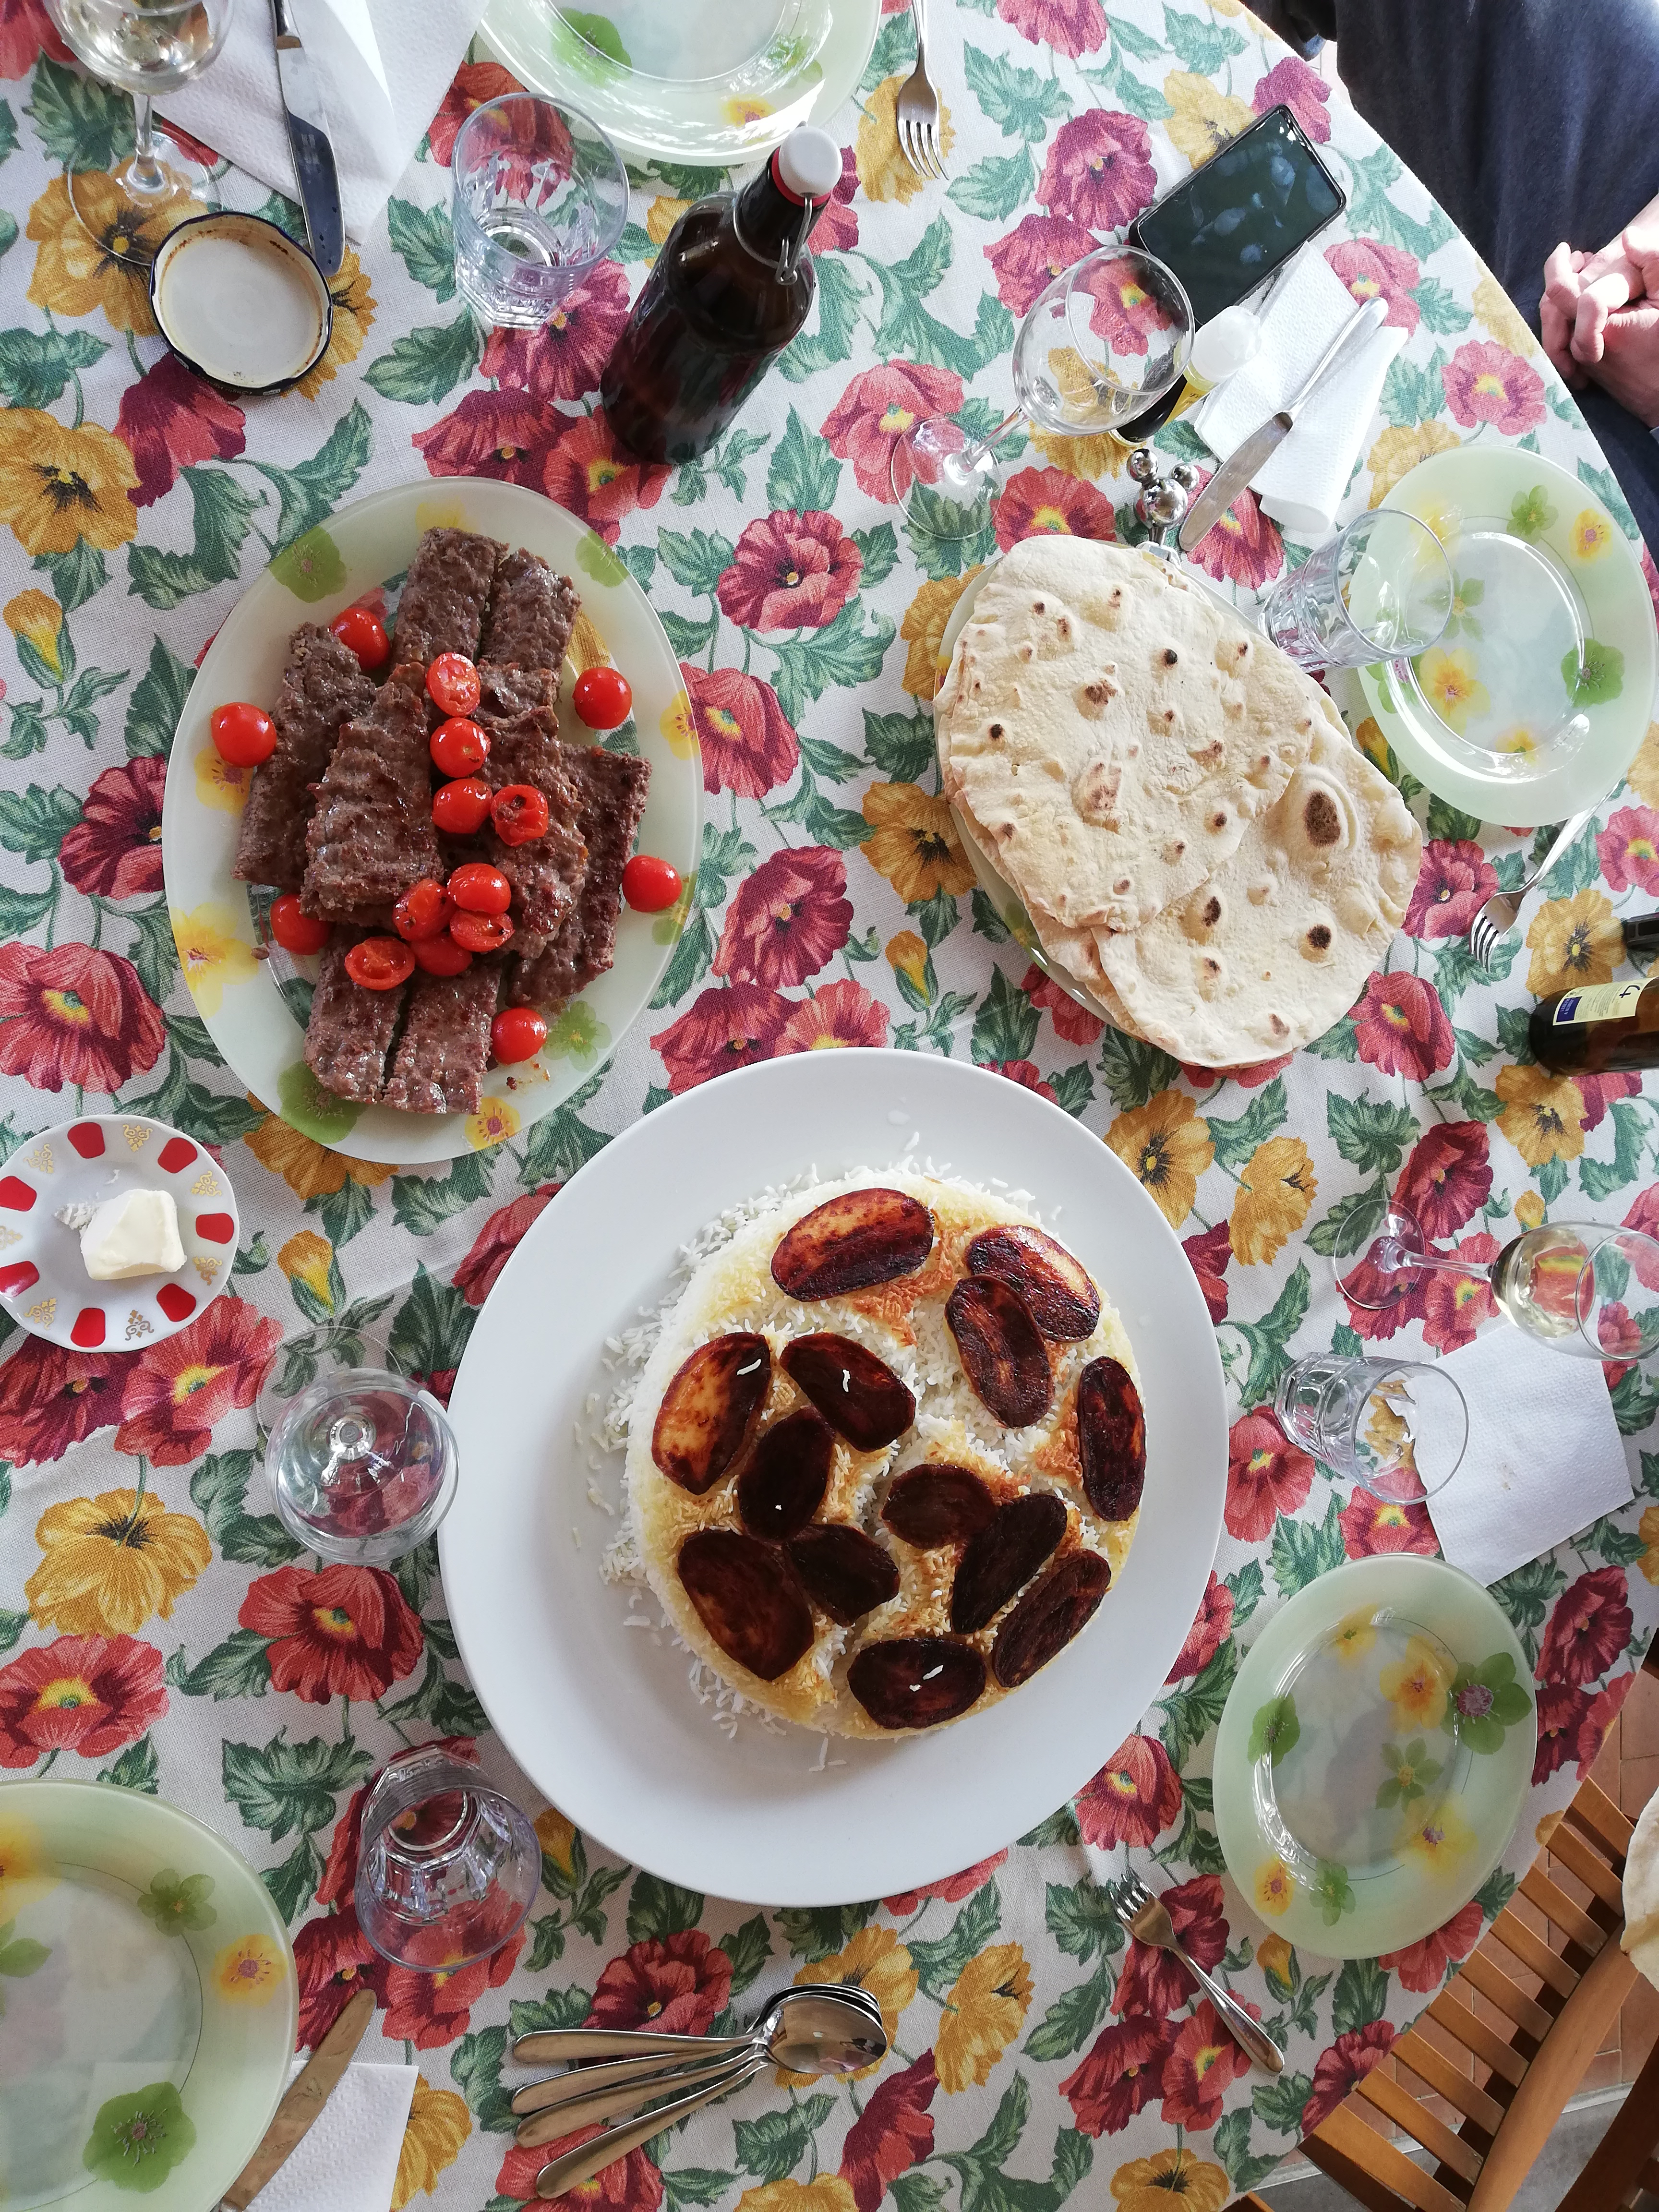 Tavola con riso e kebab